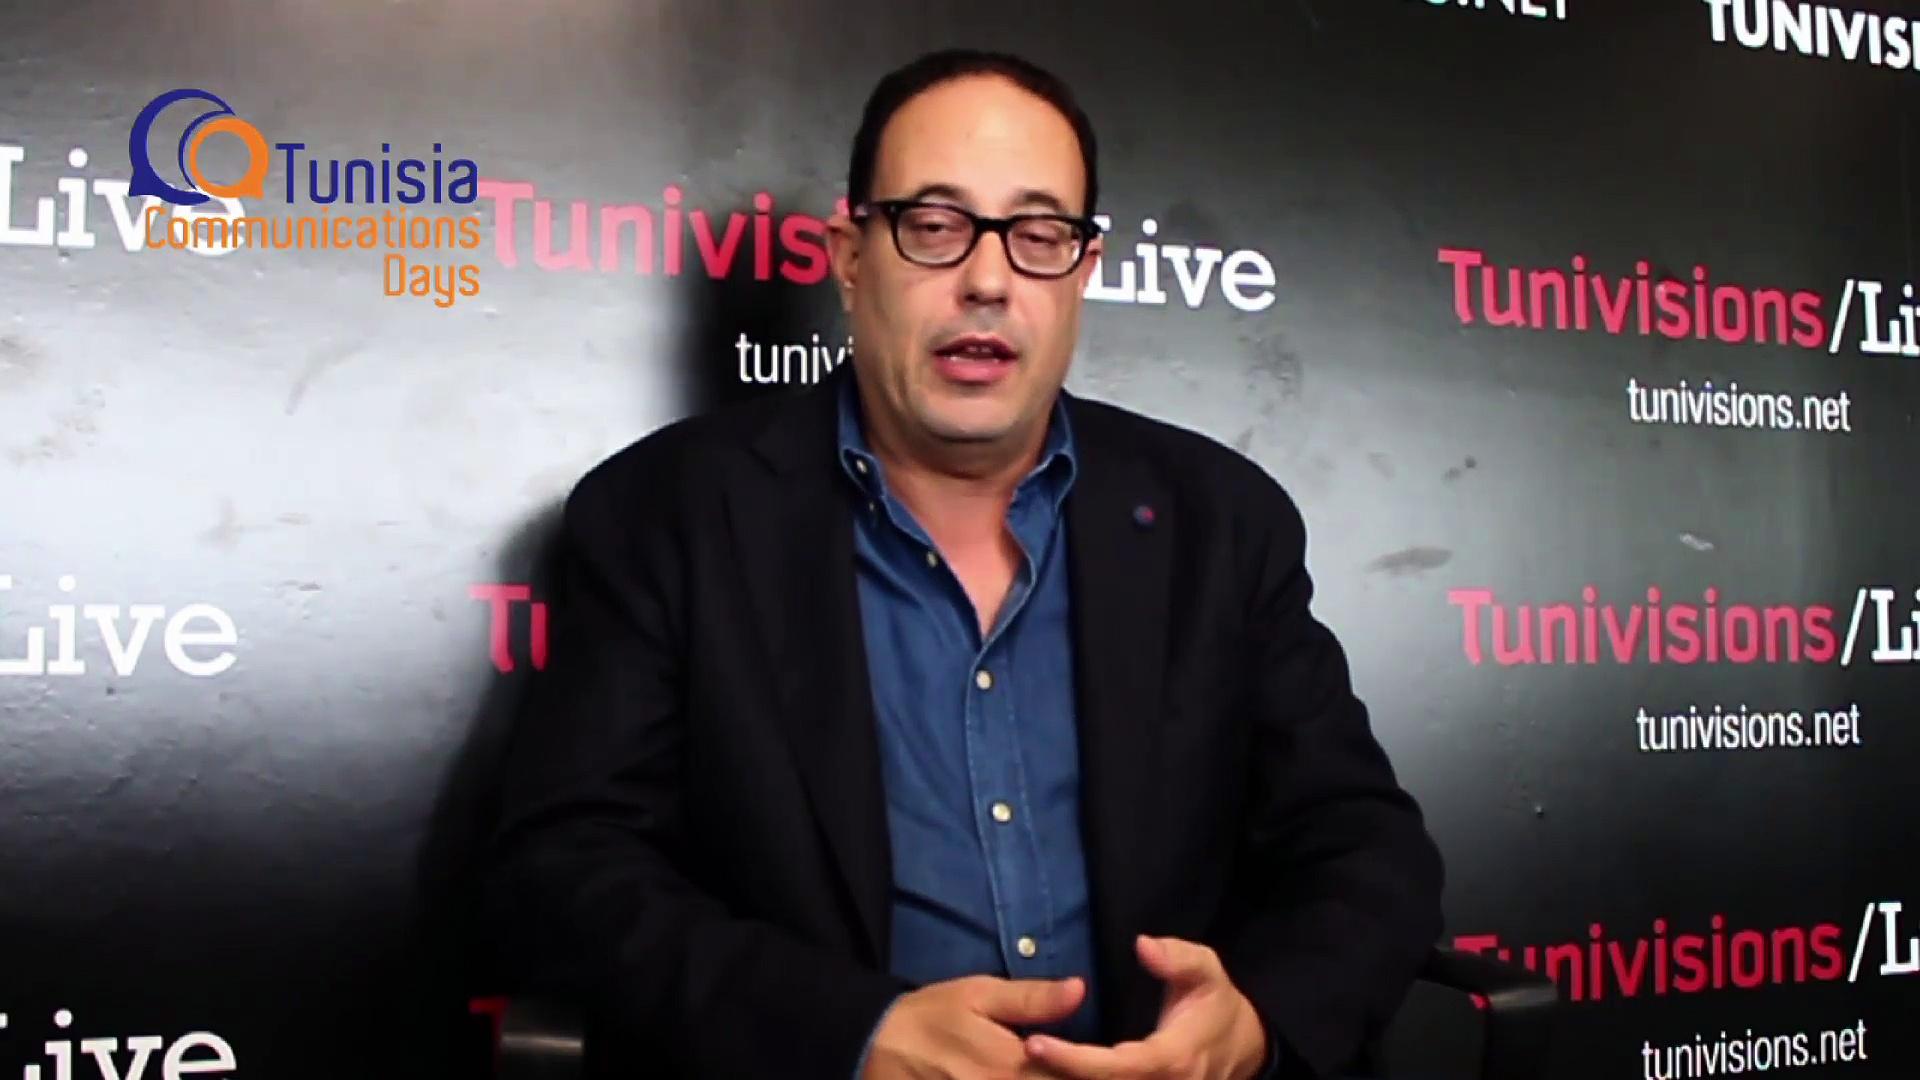 Tunisia Communications Days  4